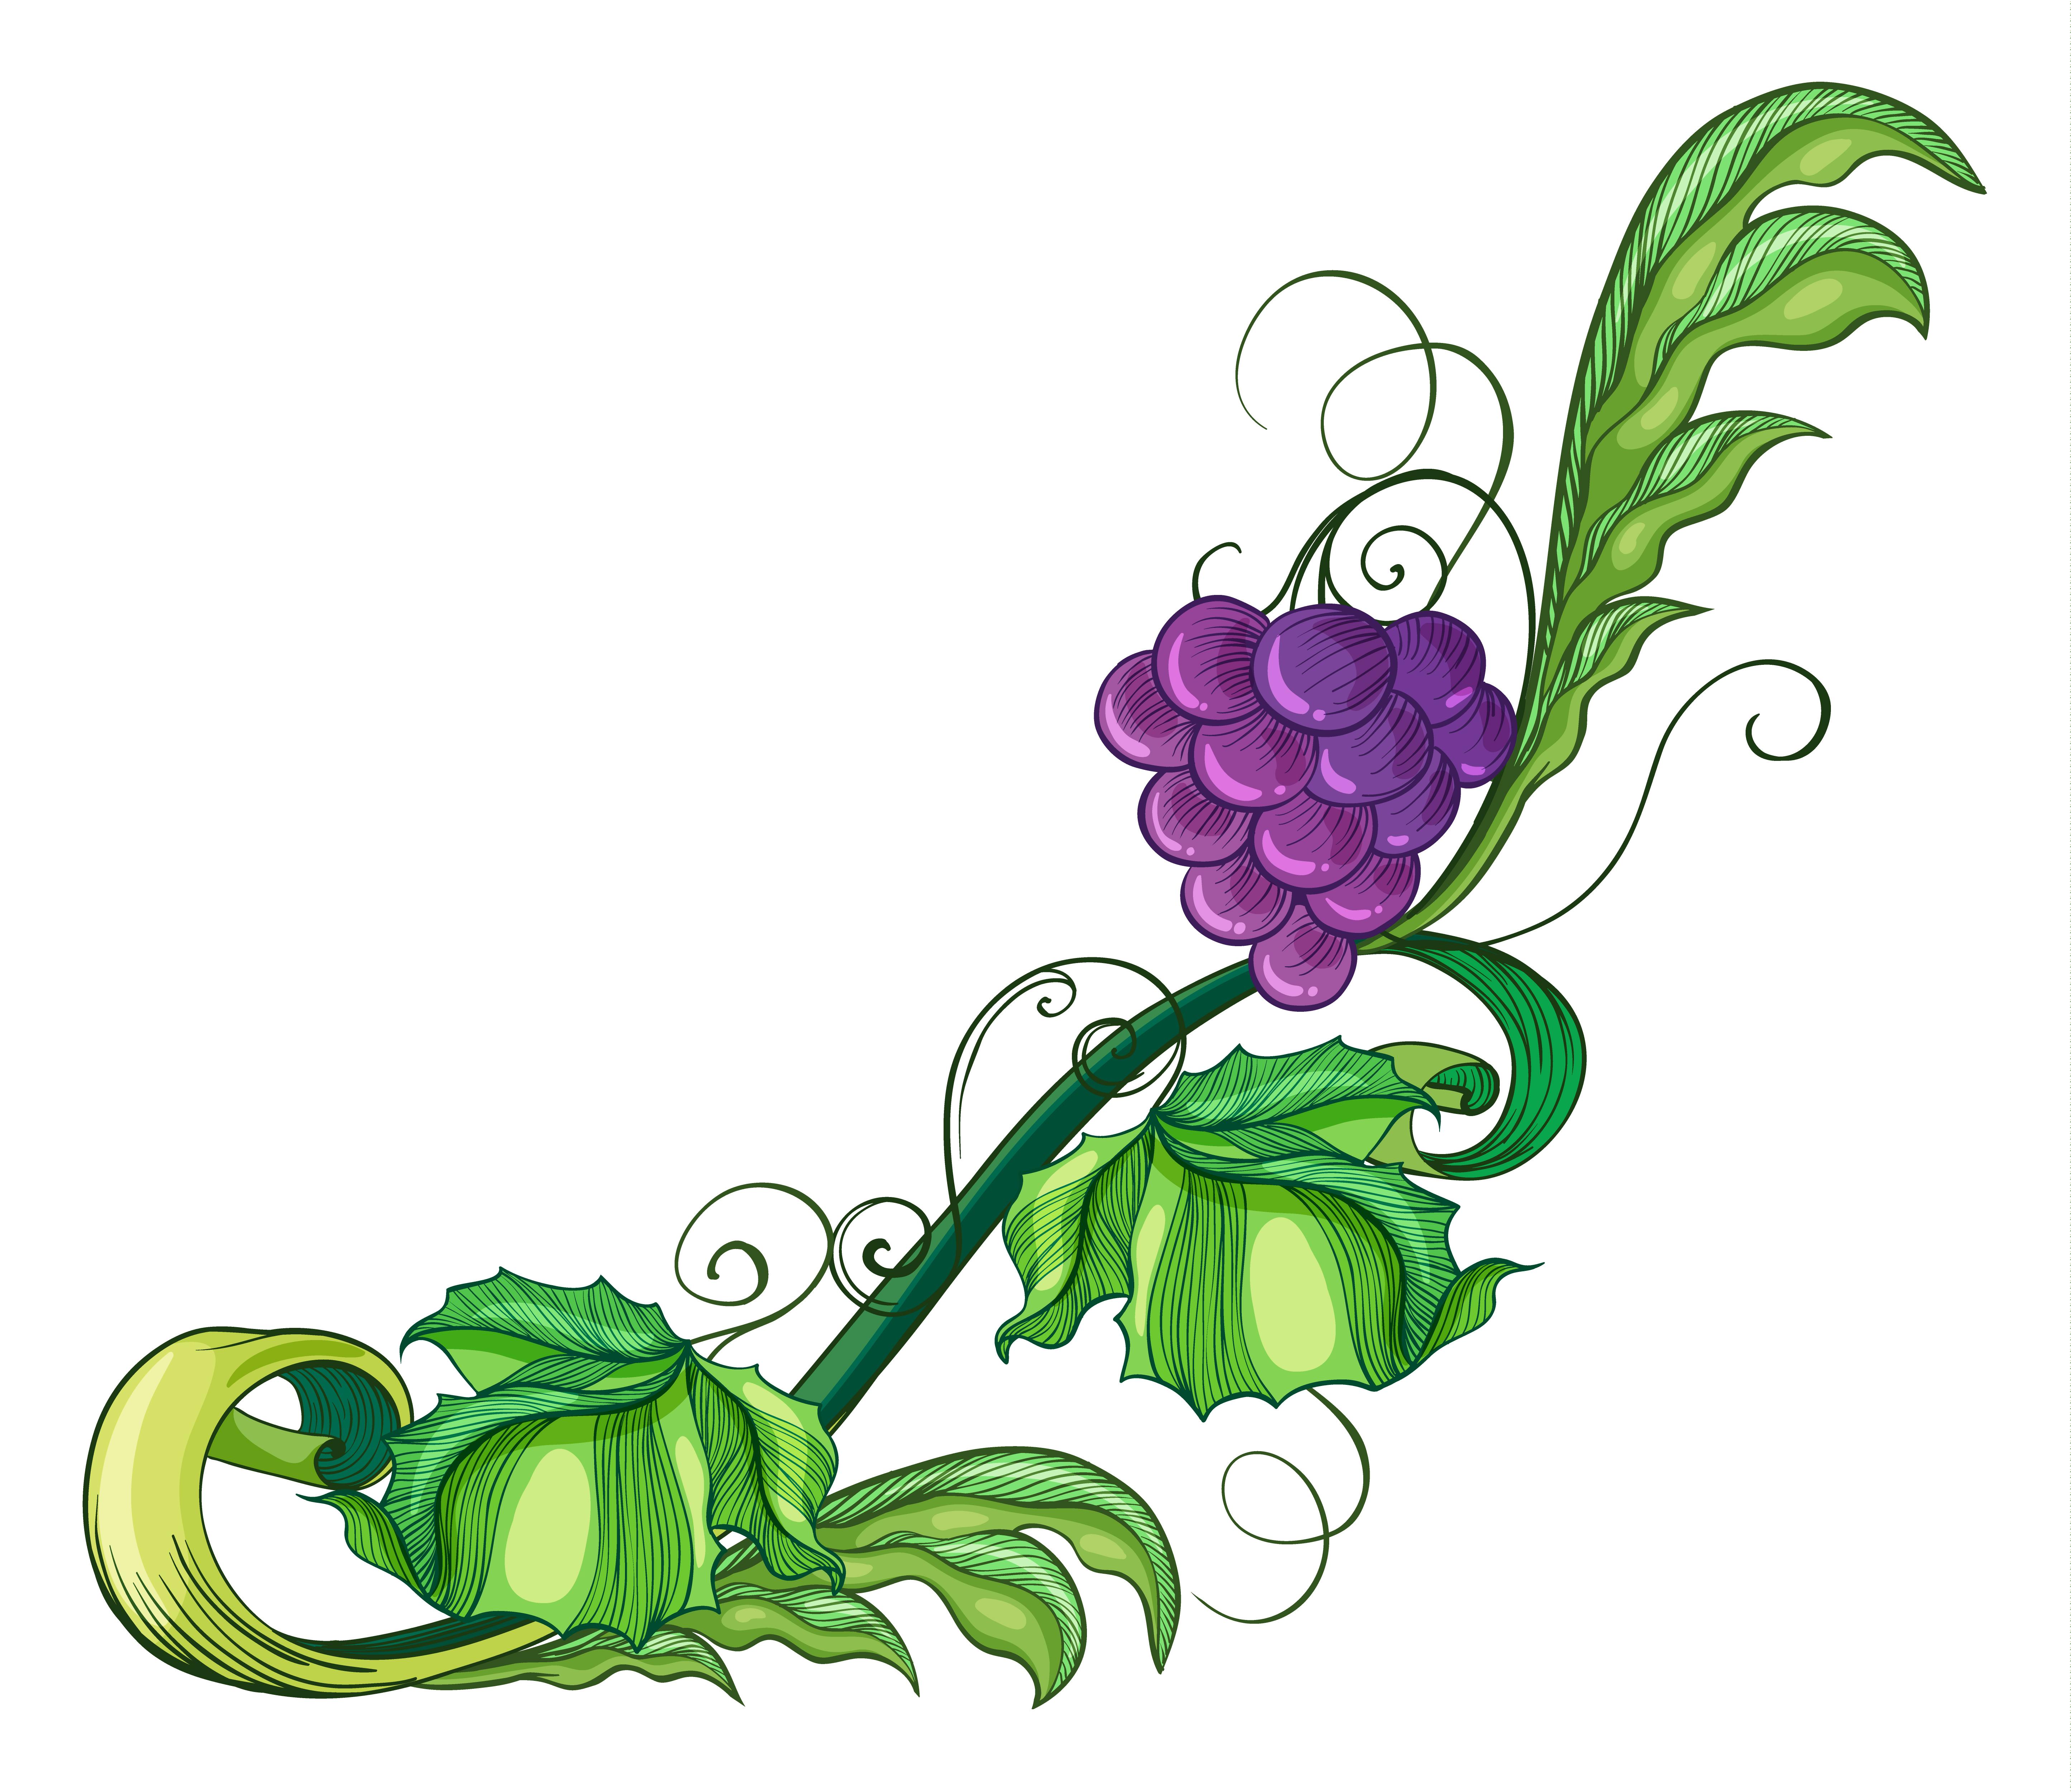 A Vine Fruit 414787 Vector Art At Vecteezy